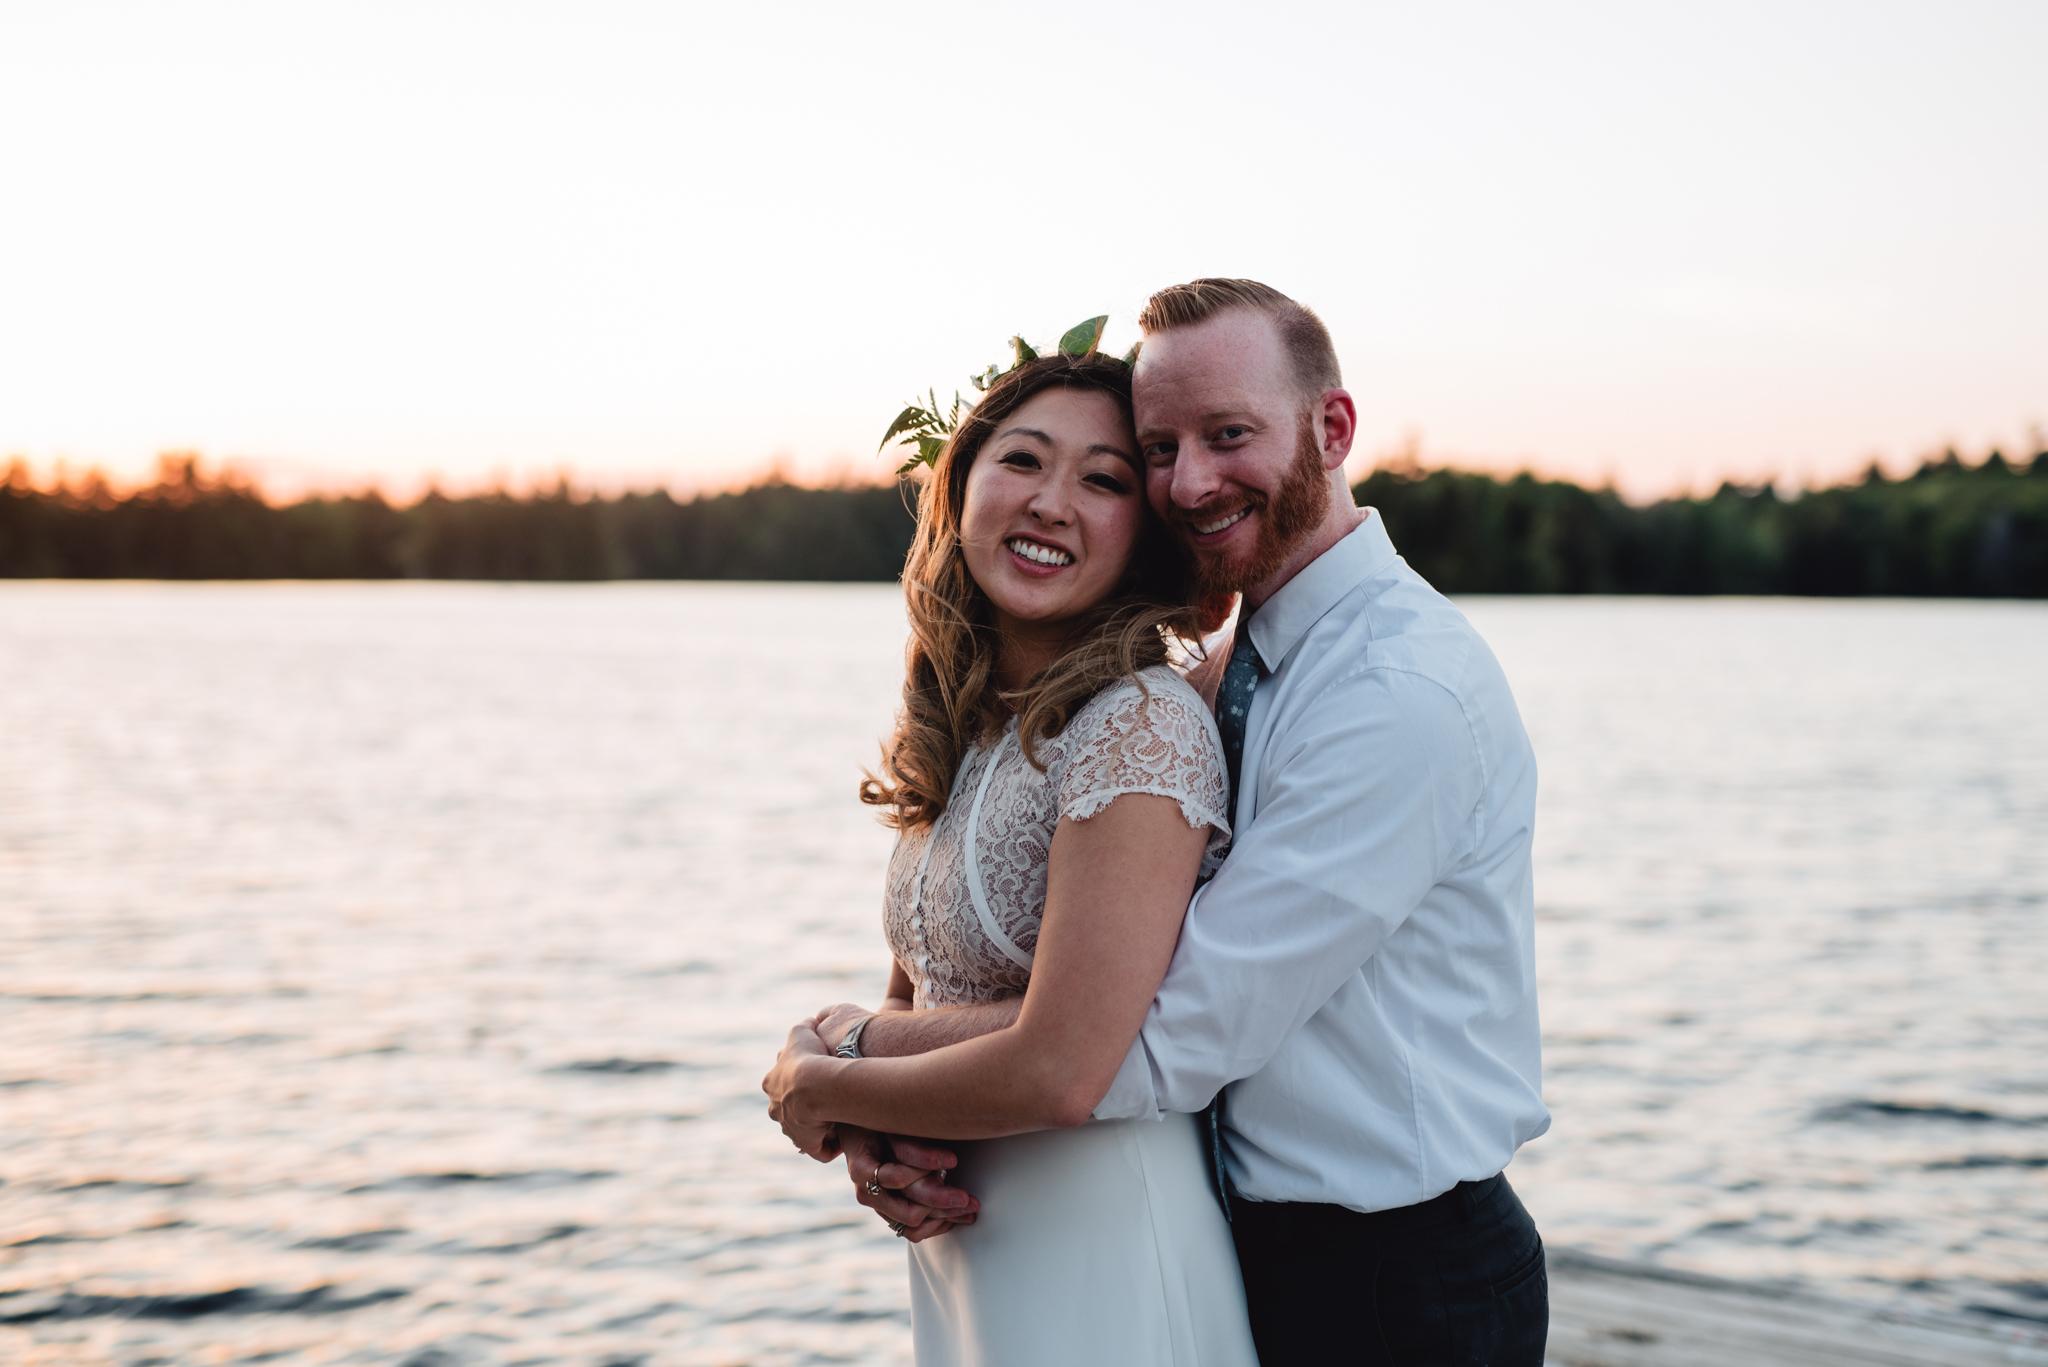 Summer Camp Wedding Photography June 2017 Massachusetts Berkshires Outdoor Wedding Photography Novella Photography Matt and Paulette Griswold (166).jpg